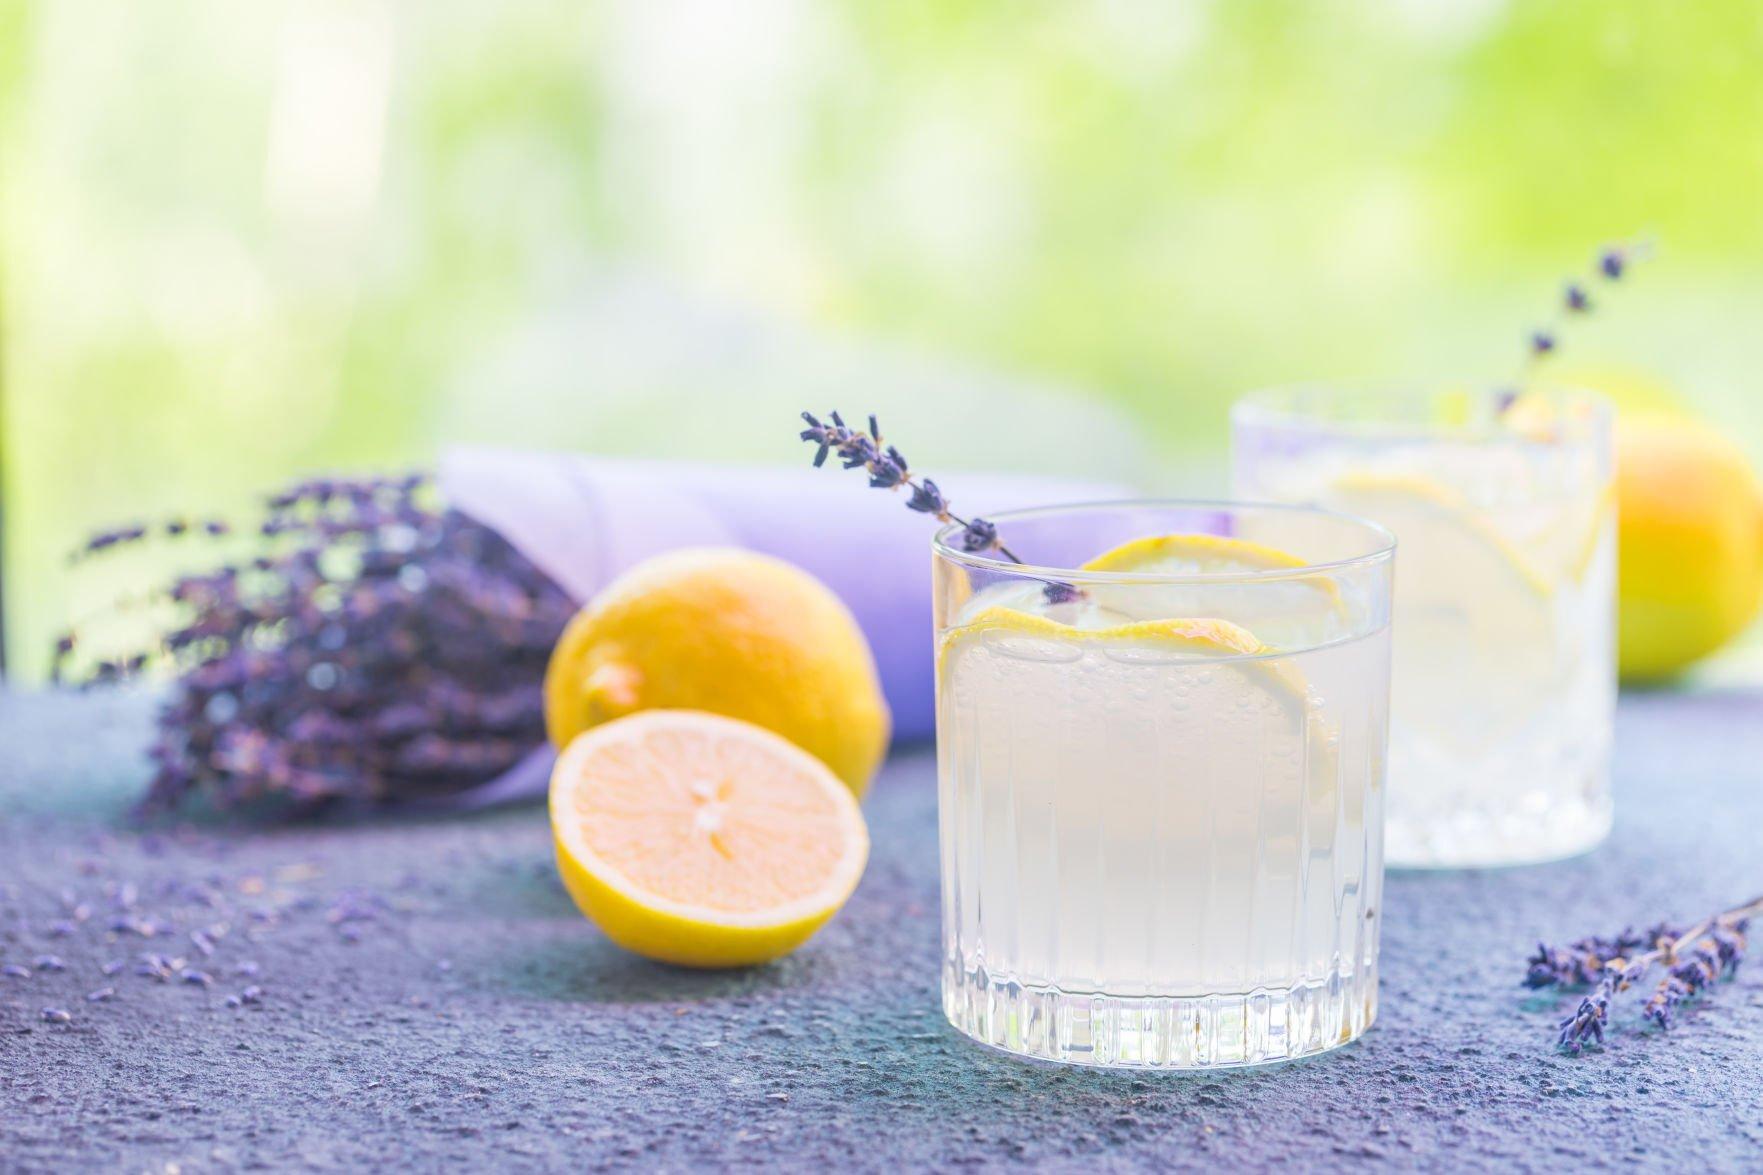 Lemonade with lemons and lavender